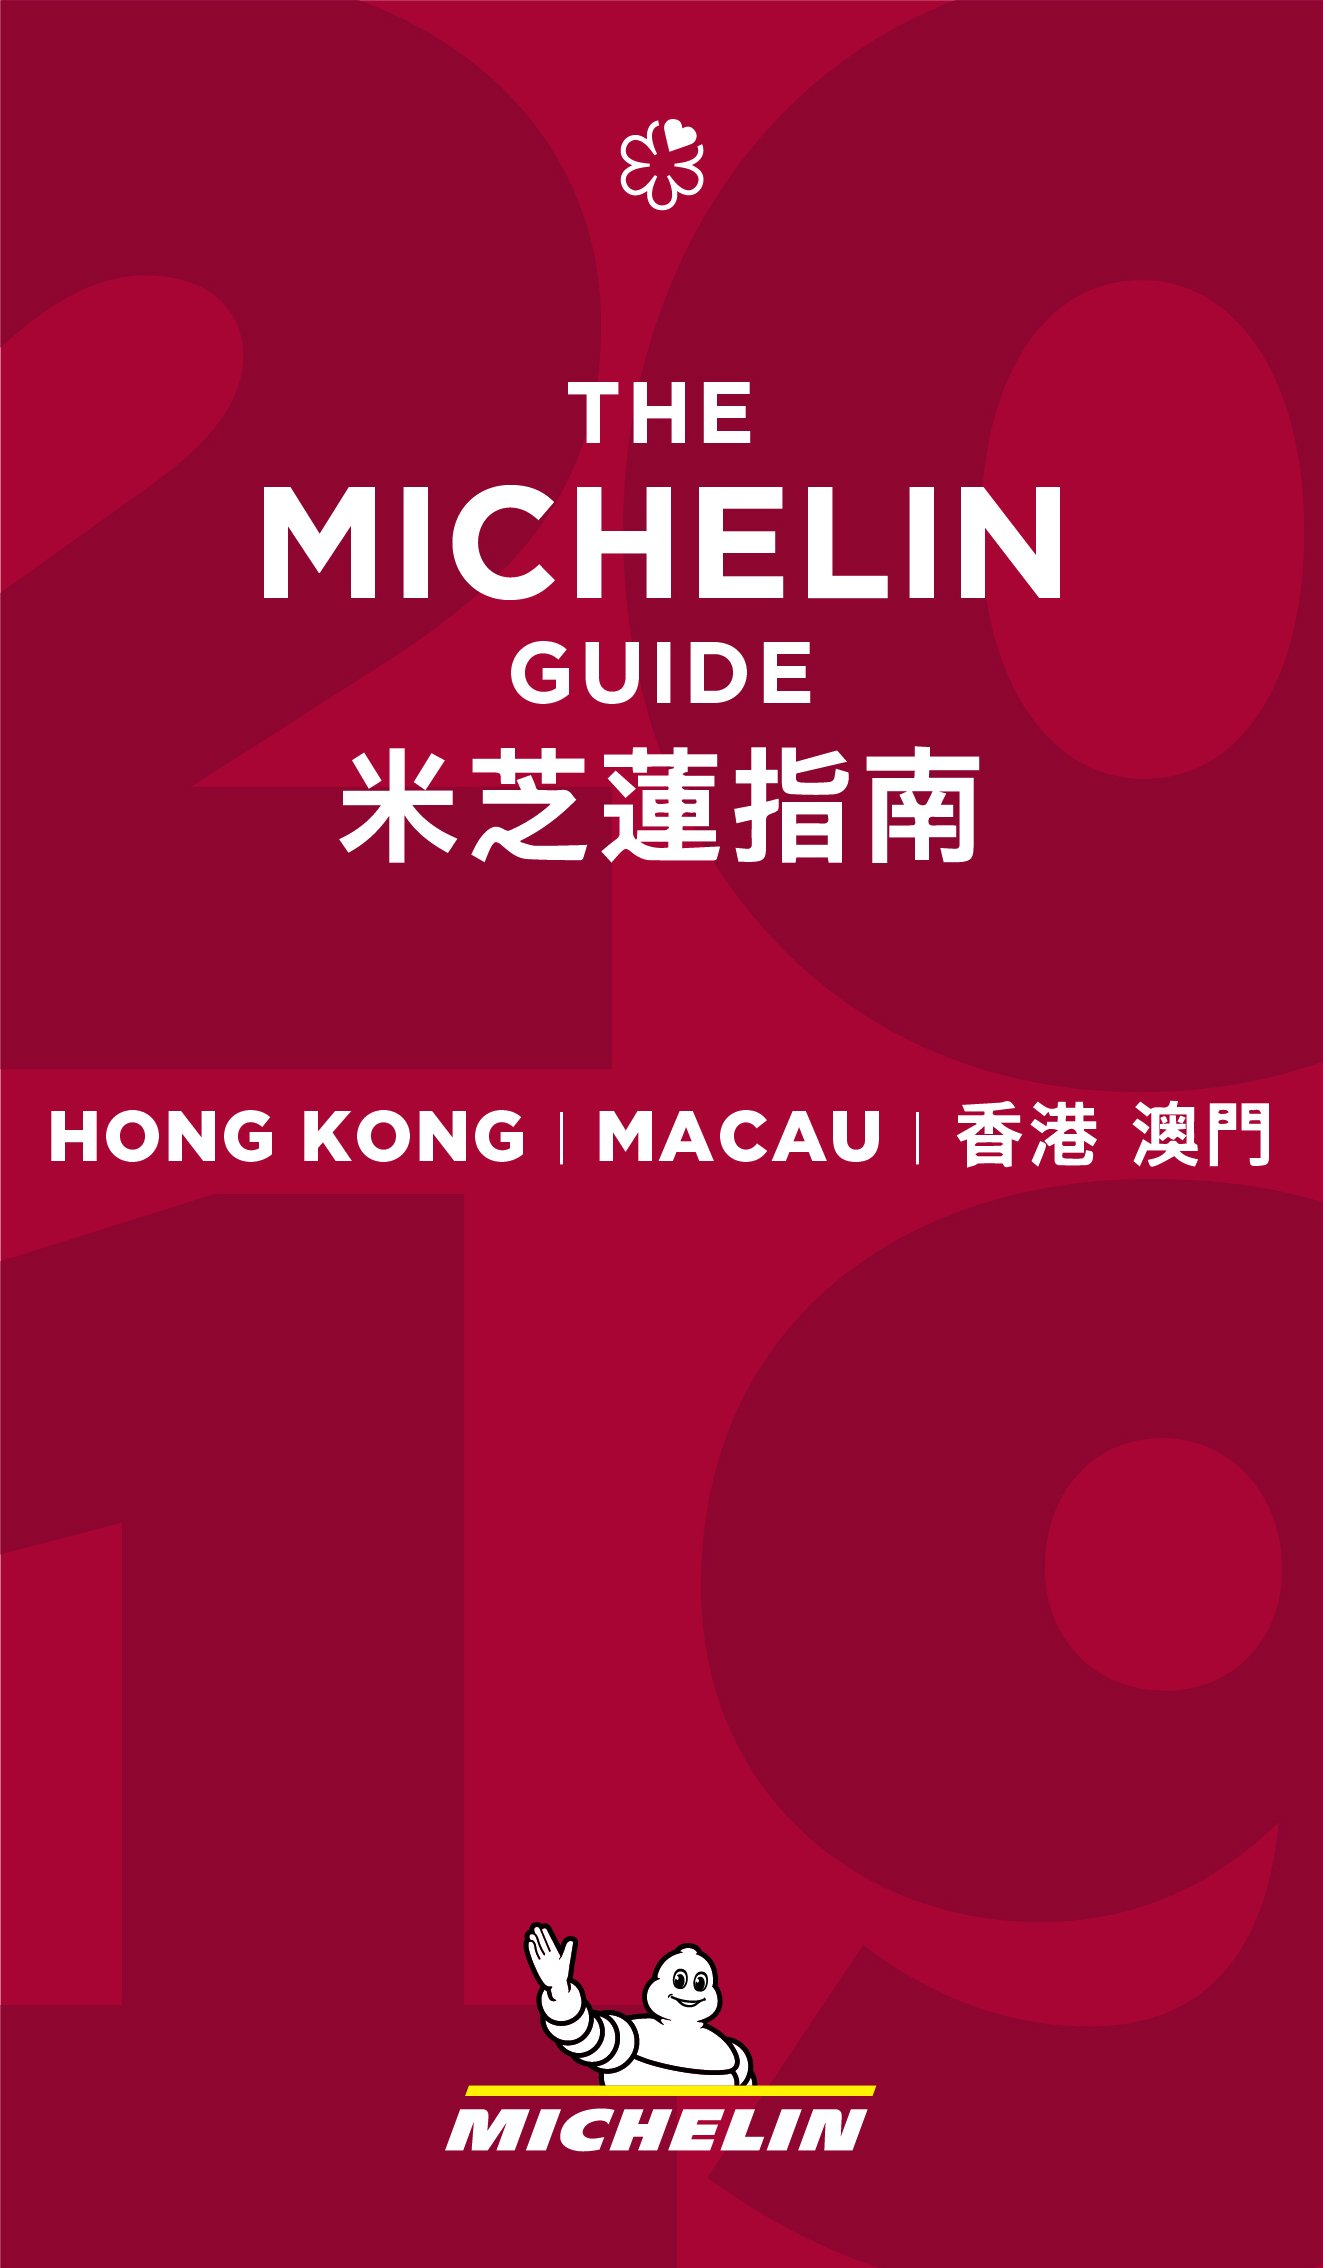 Risultati immagini per guida michelin hong kong - macau 2019